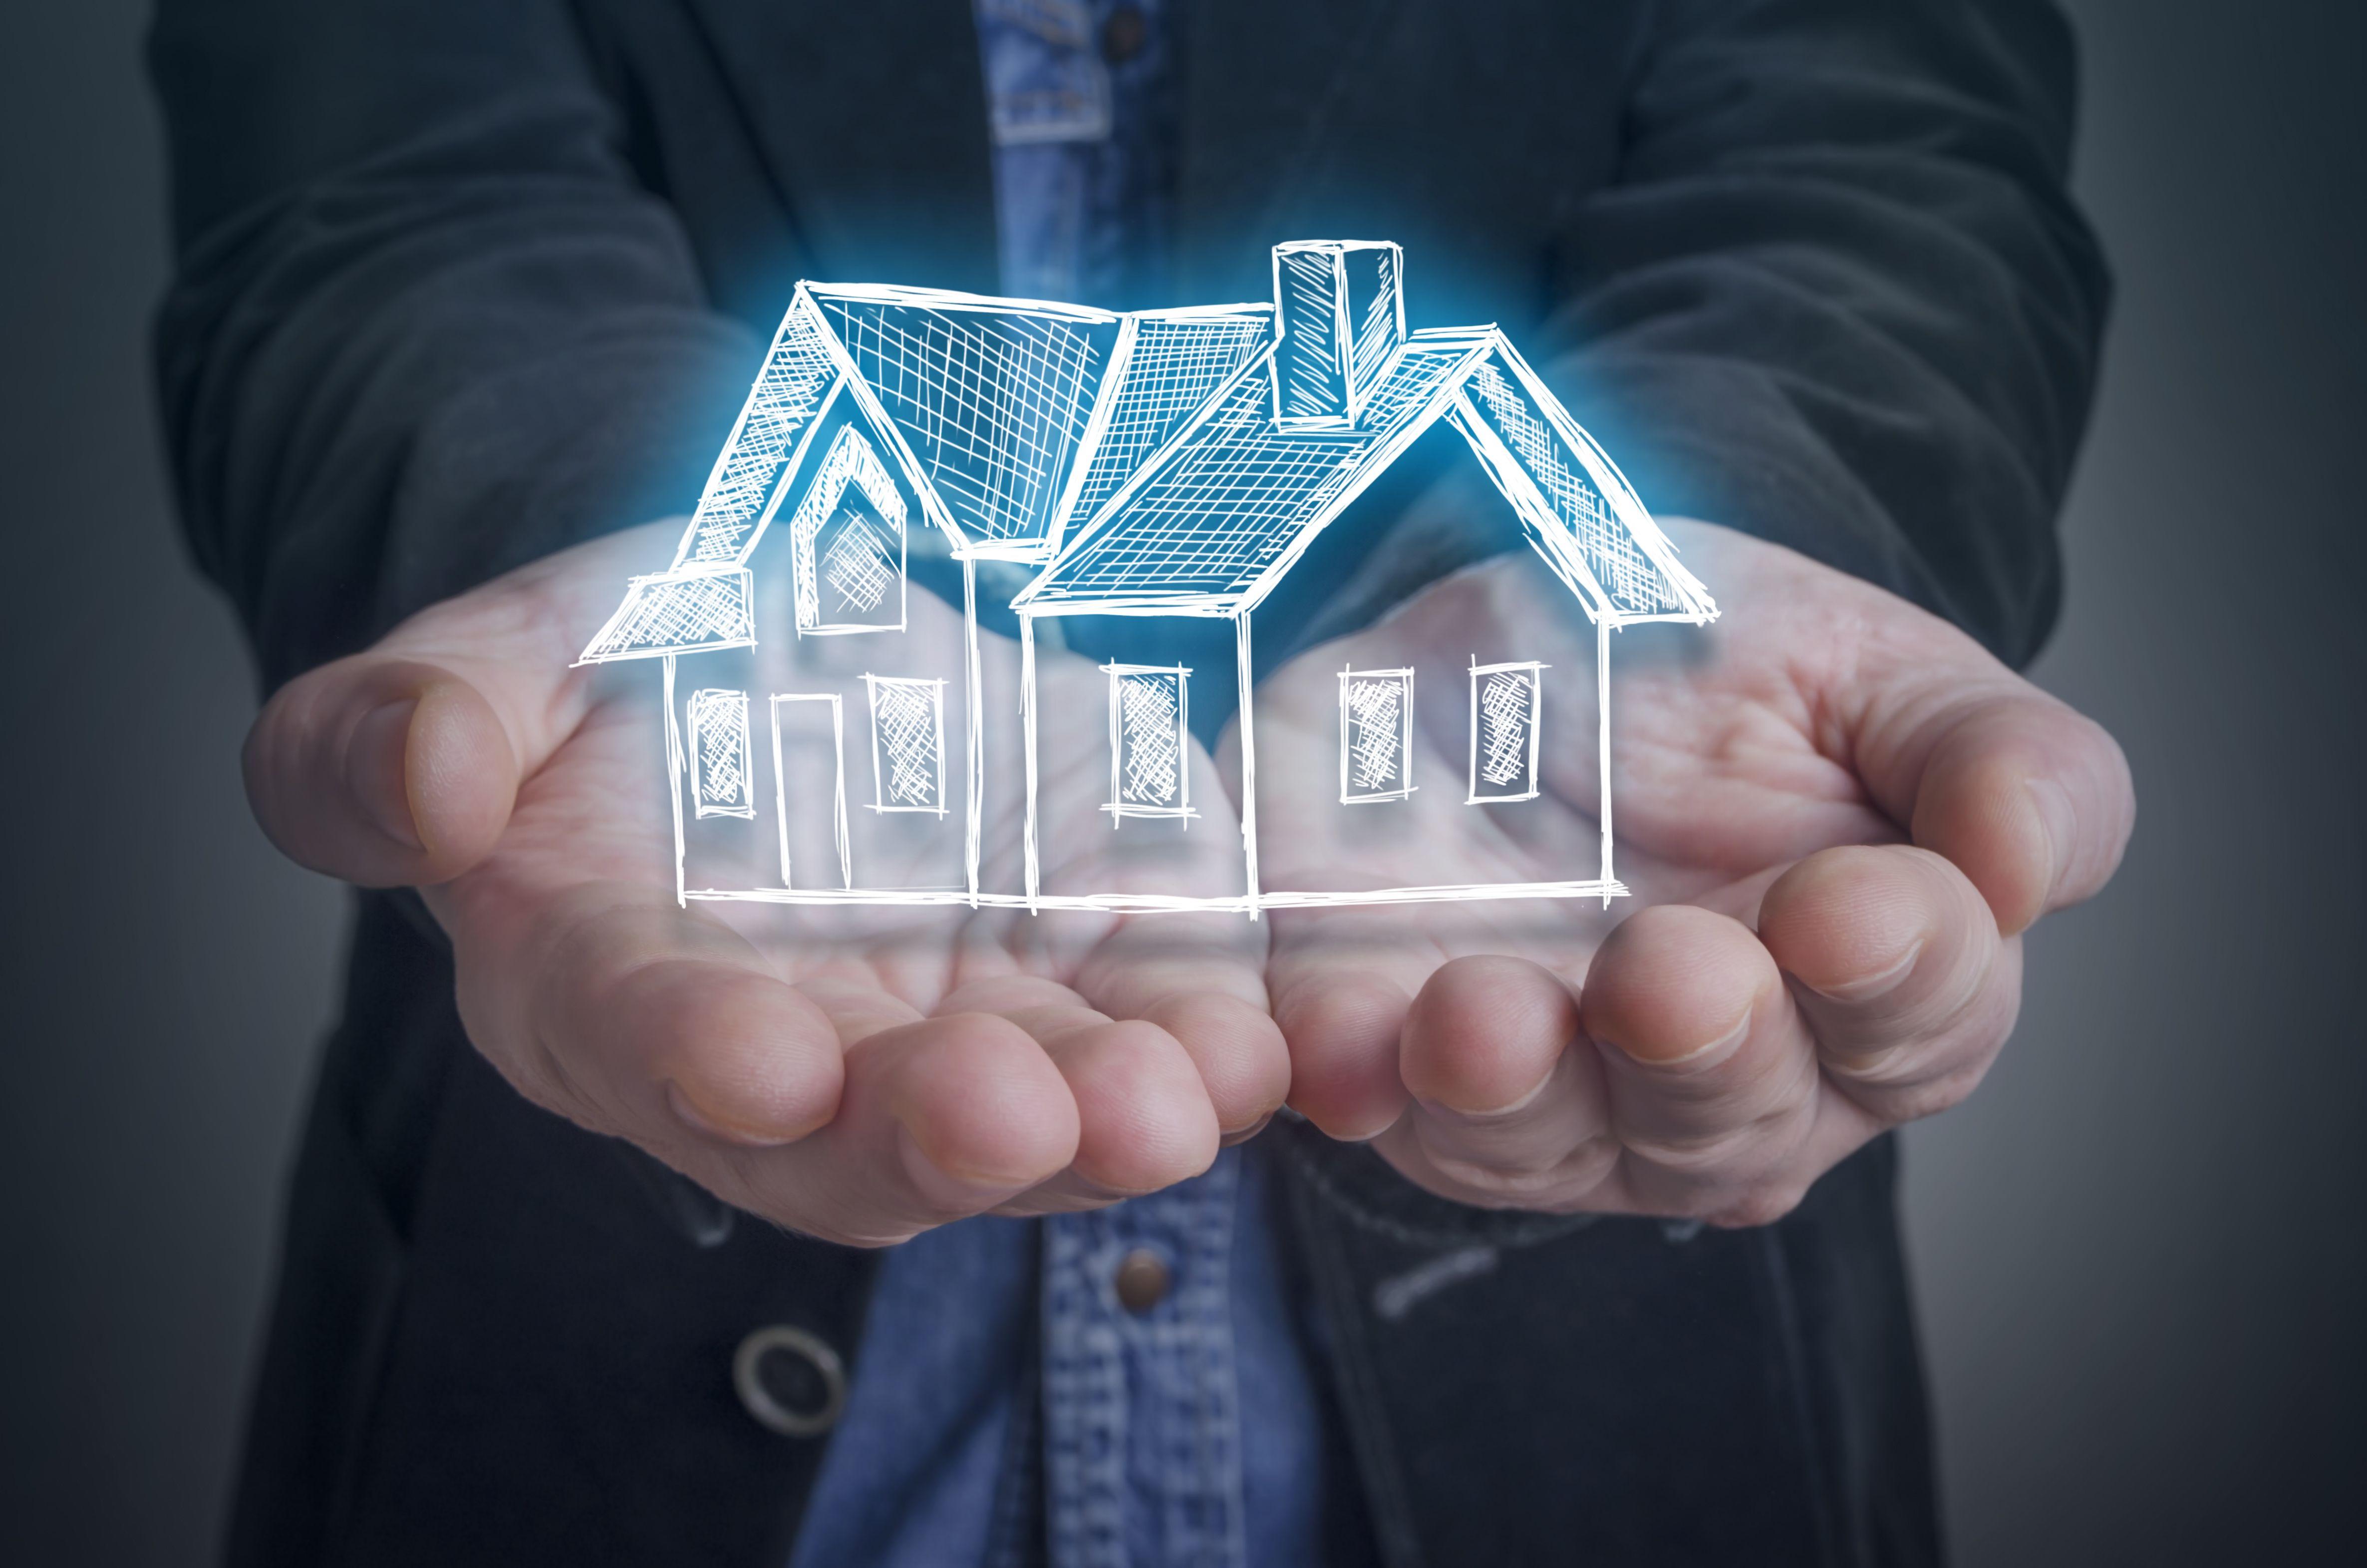 Abogados especializados en derecho inmobiliario en Valencia, Abogados derec